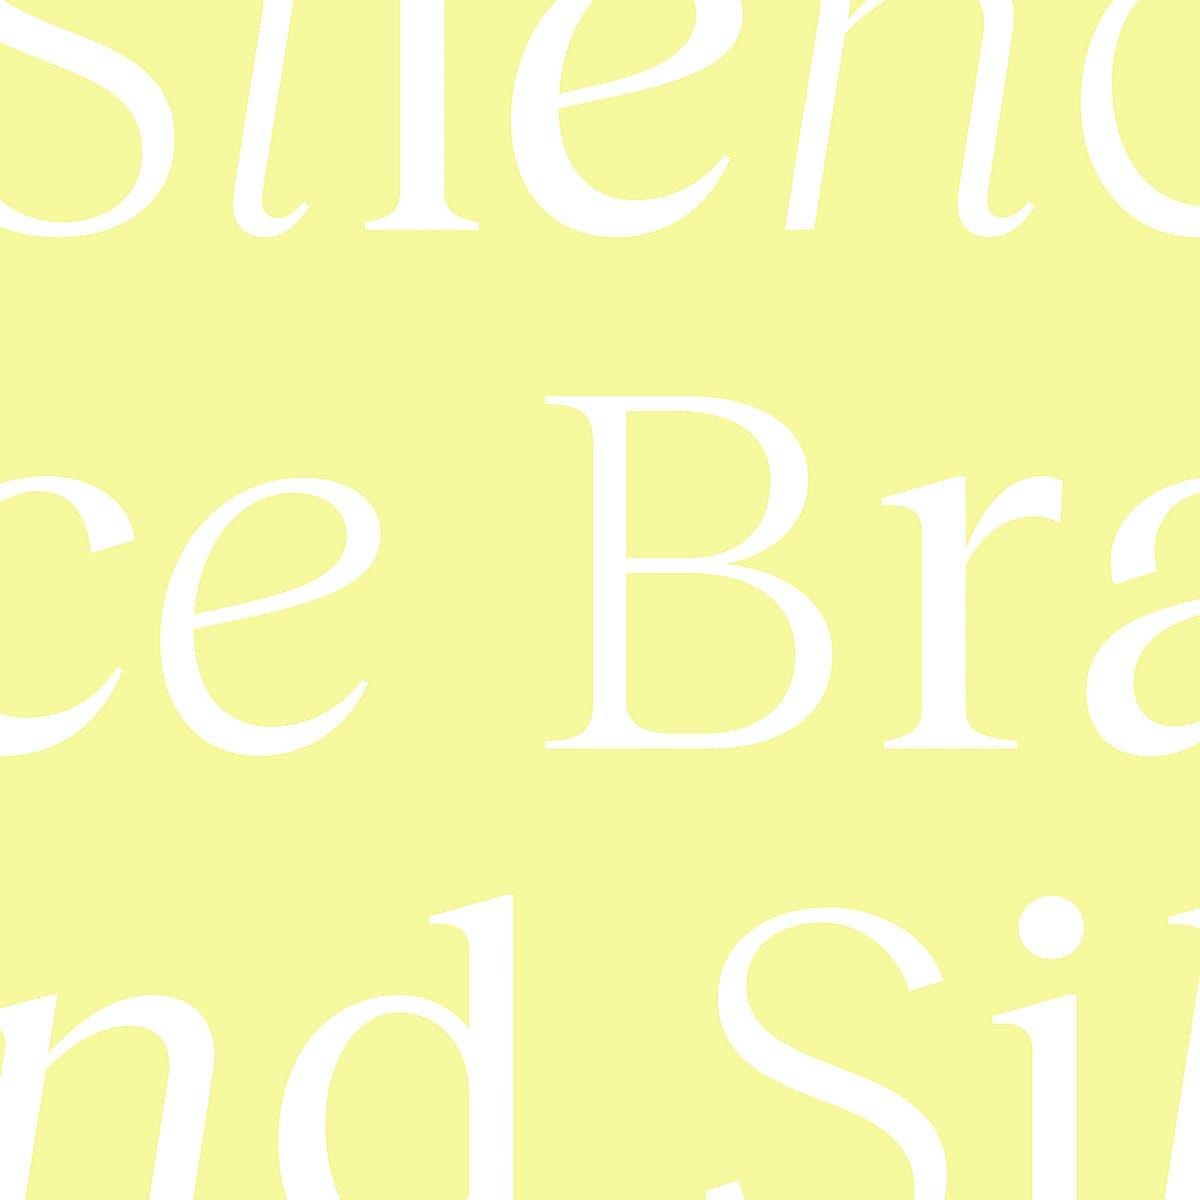 T2 03 Silence Brand